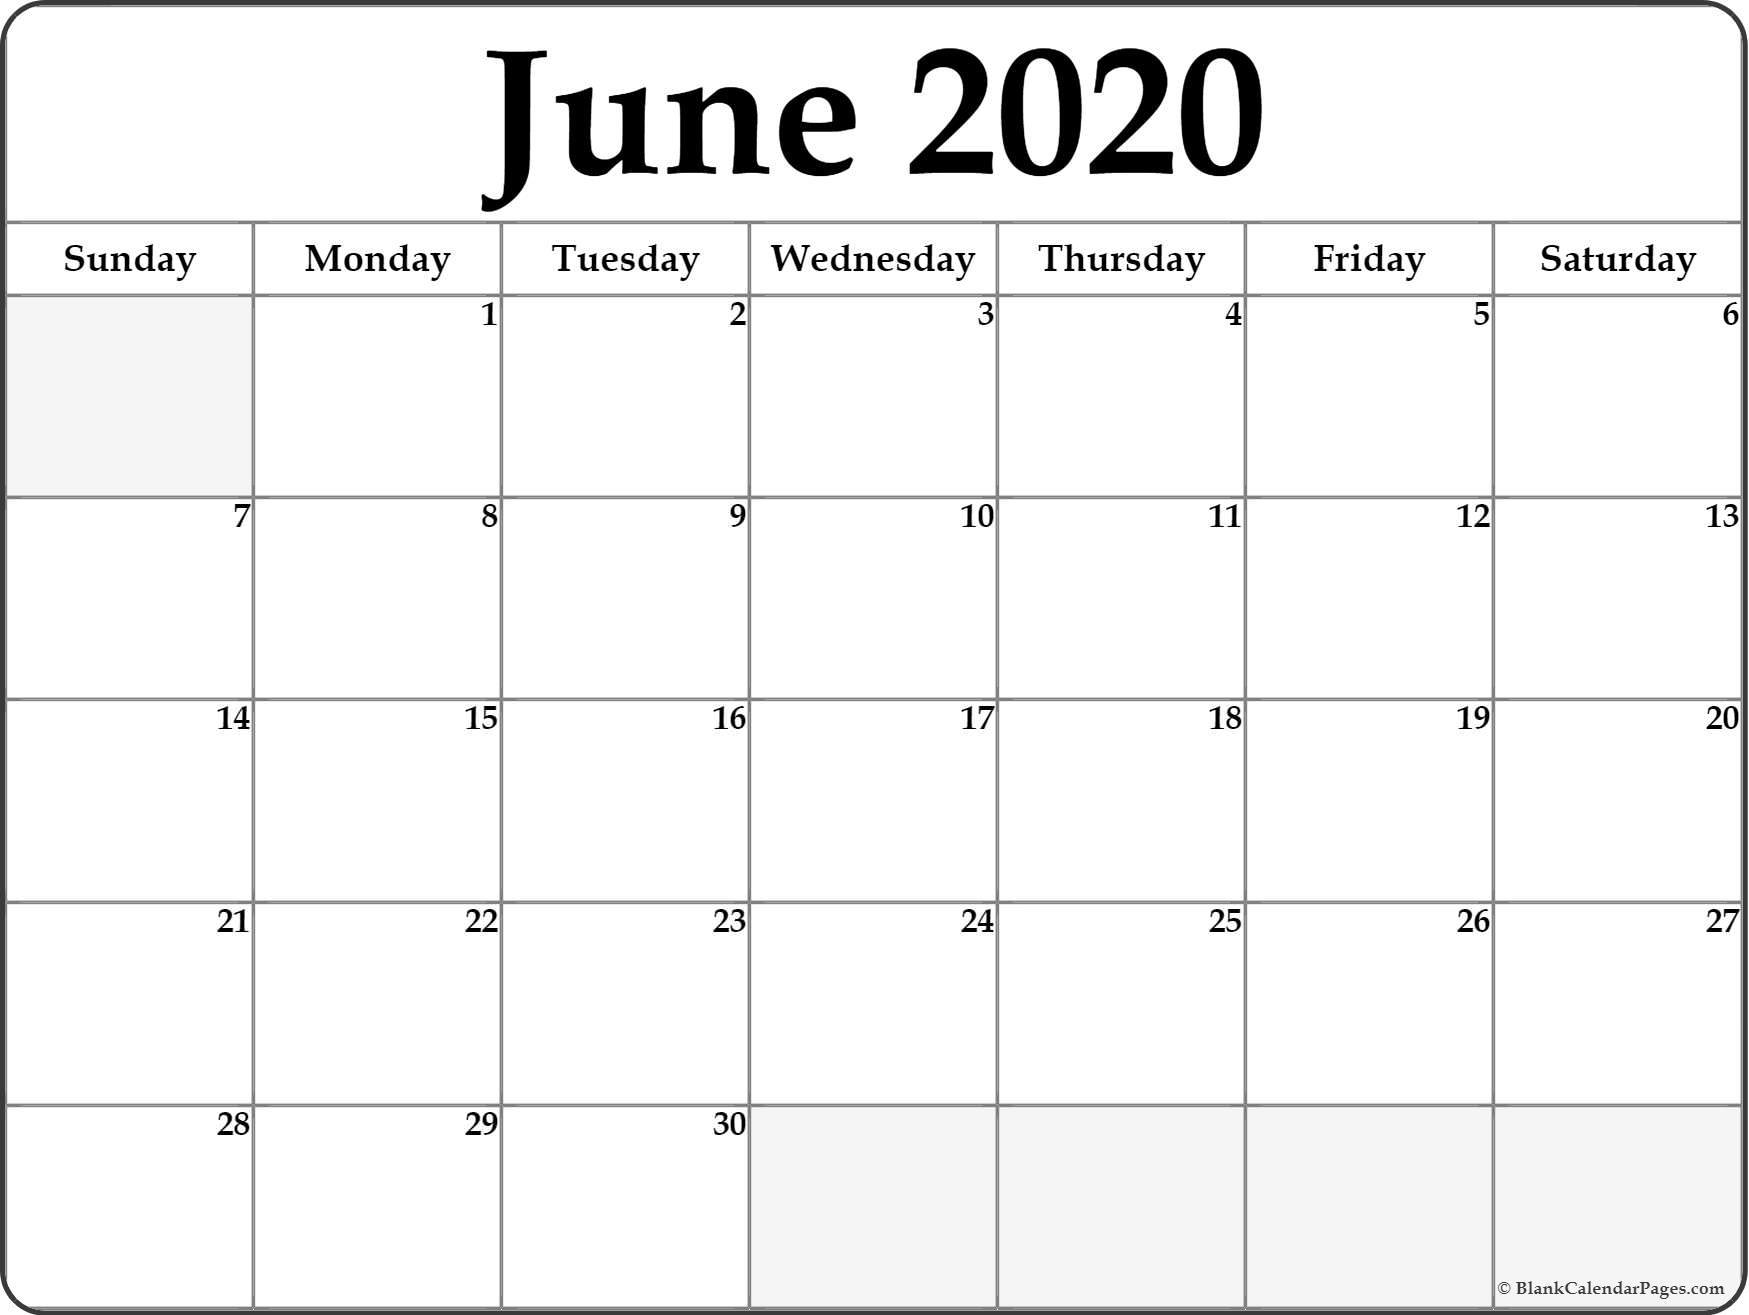 June 2020 Calendar | Free Printable Monthly Calendars with regard to Free Printable Calendar July 2019-June 2020